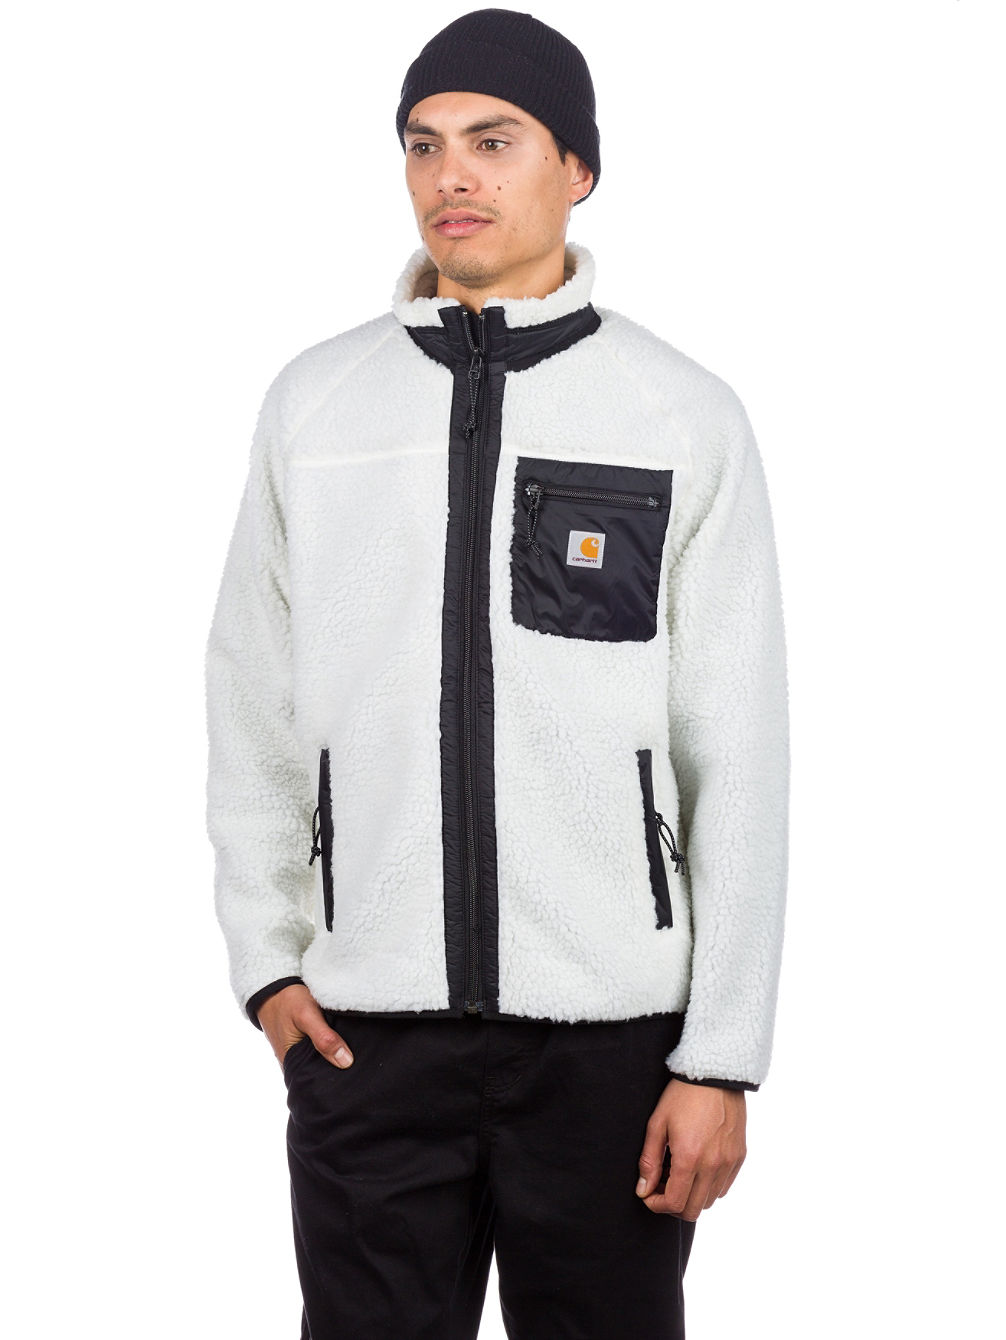 c185a08c51c Buy Carhartt WIP Prentis Liner Jacket online at Blue Tomato